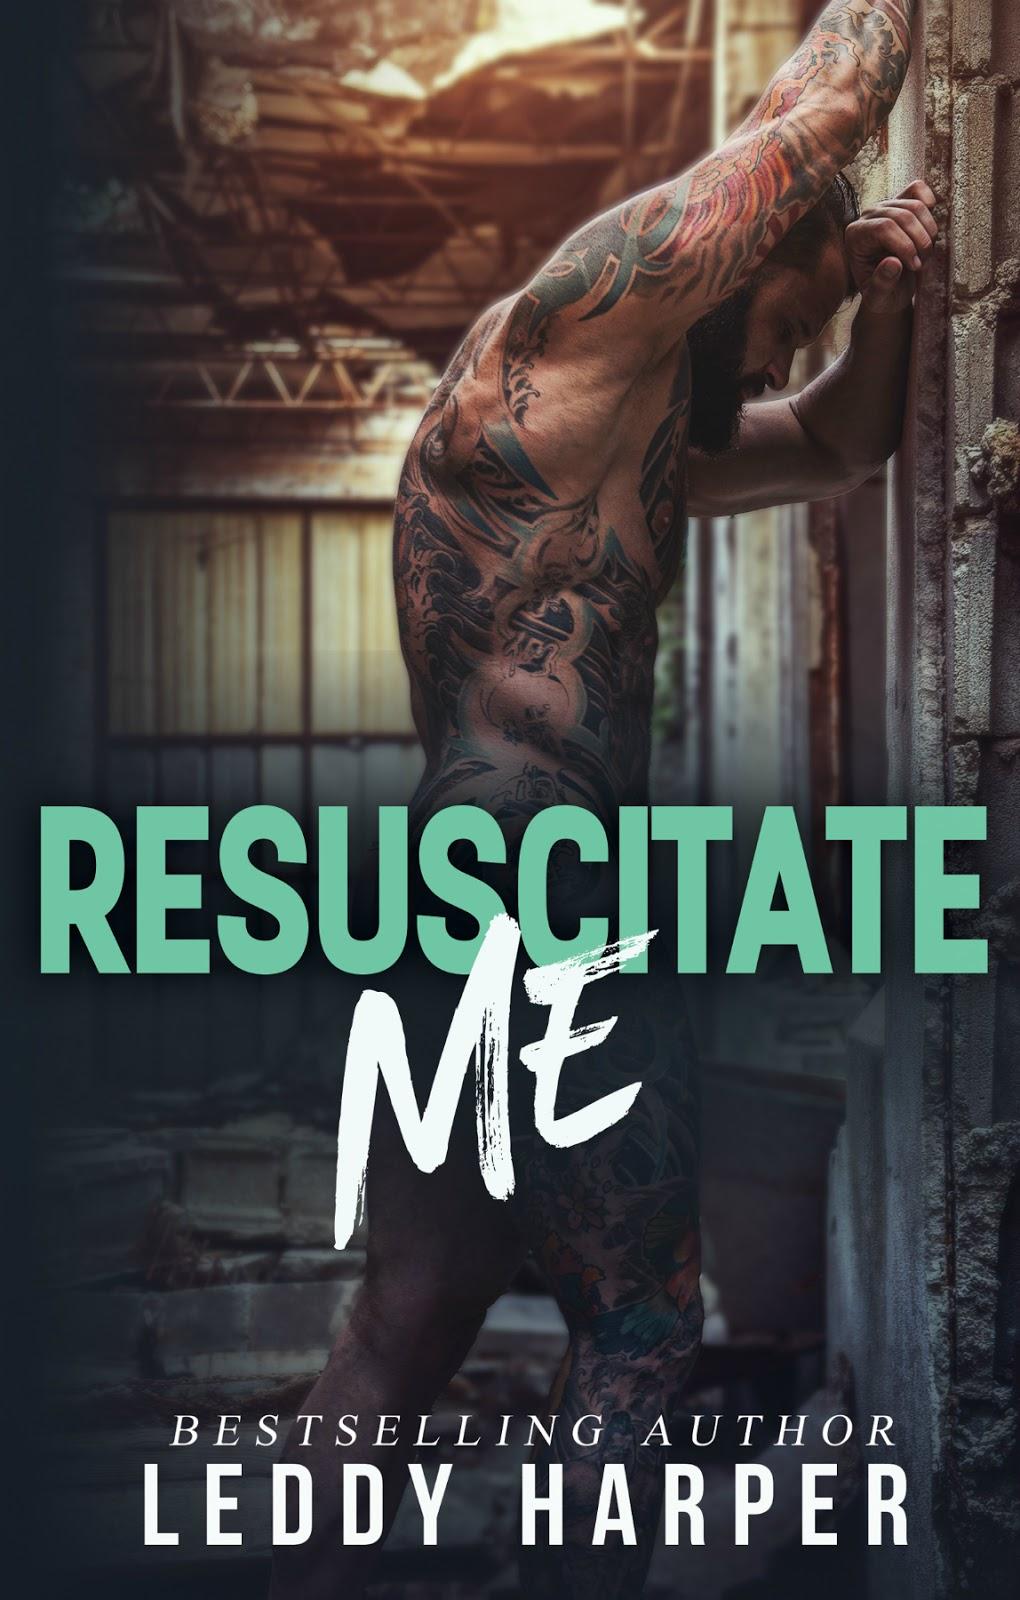 Title: Resuscitate Me 7b2f0d05e7854fe3c09e6c9fba51efe4